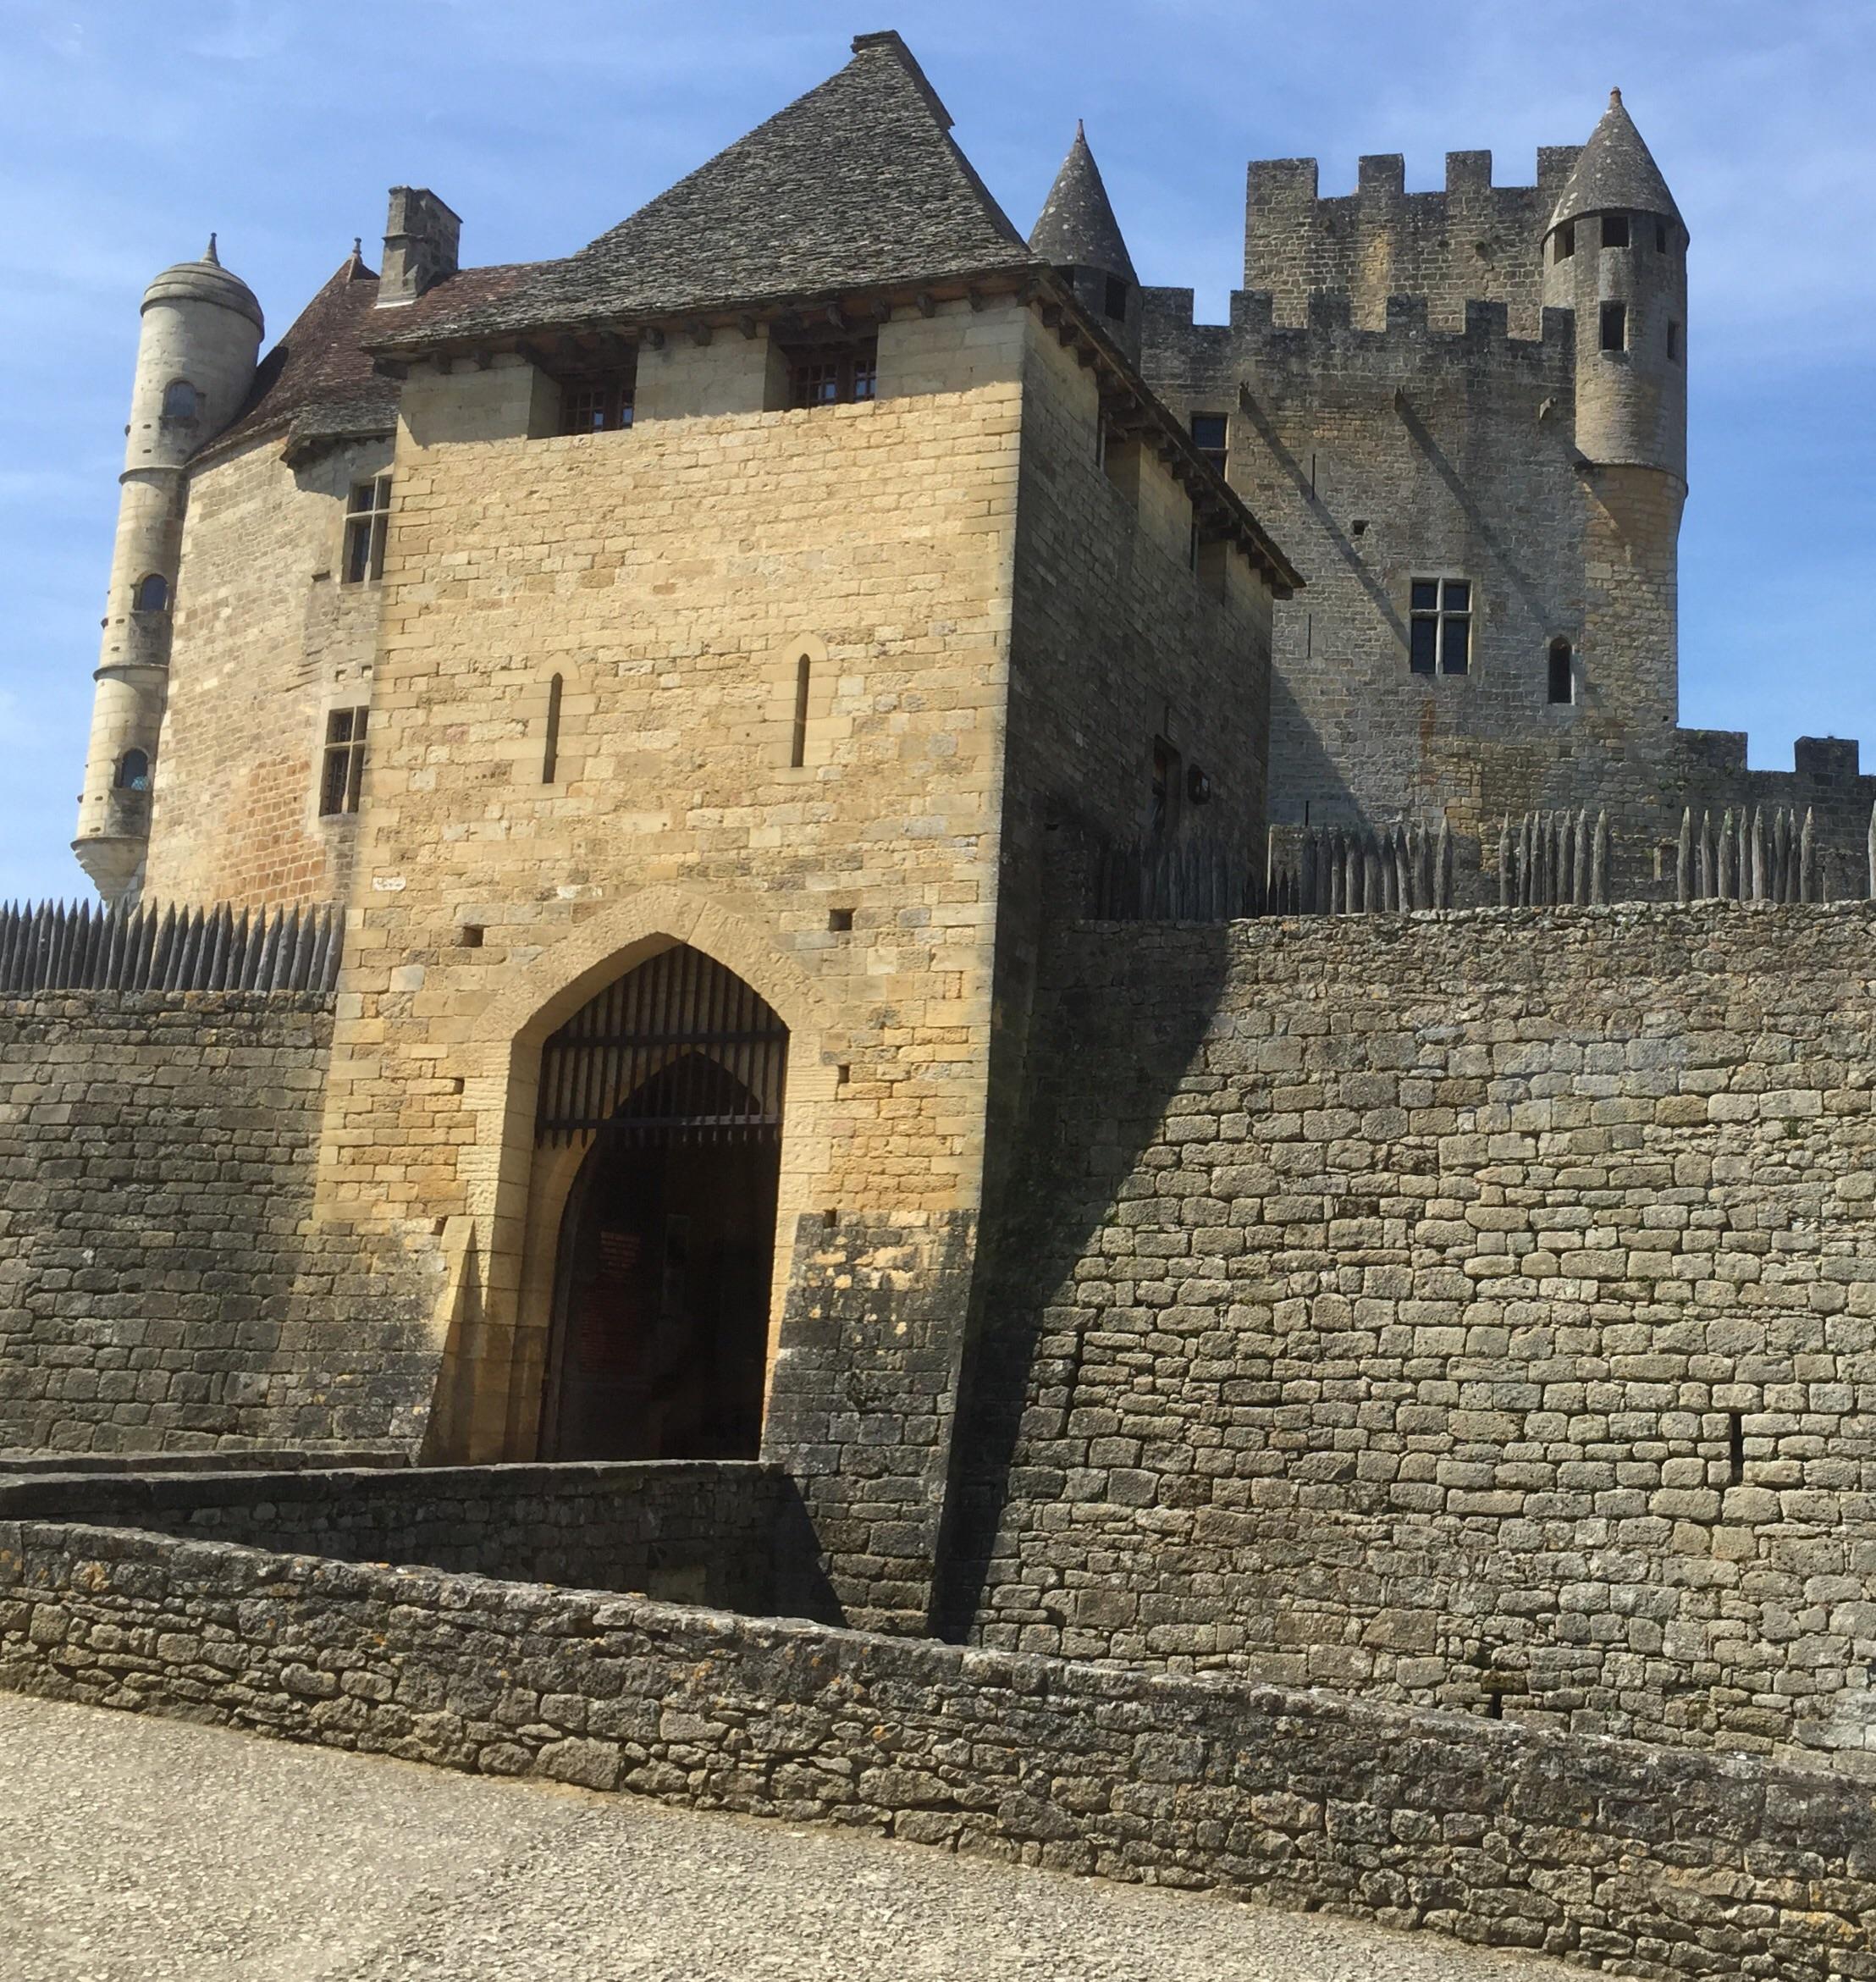 Entrance to Castle Beynac